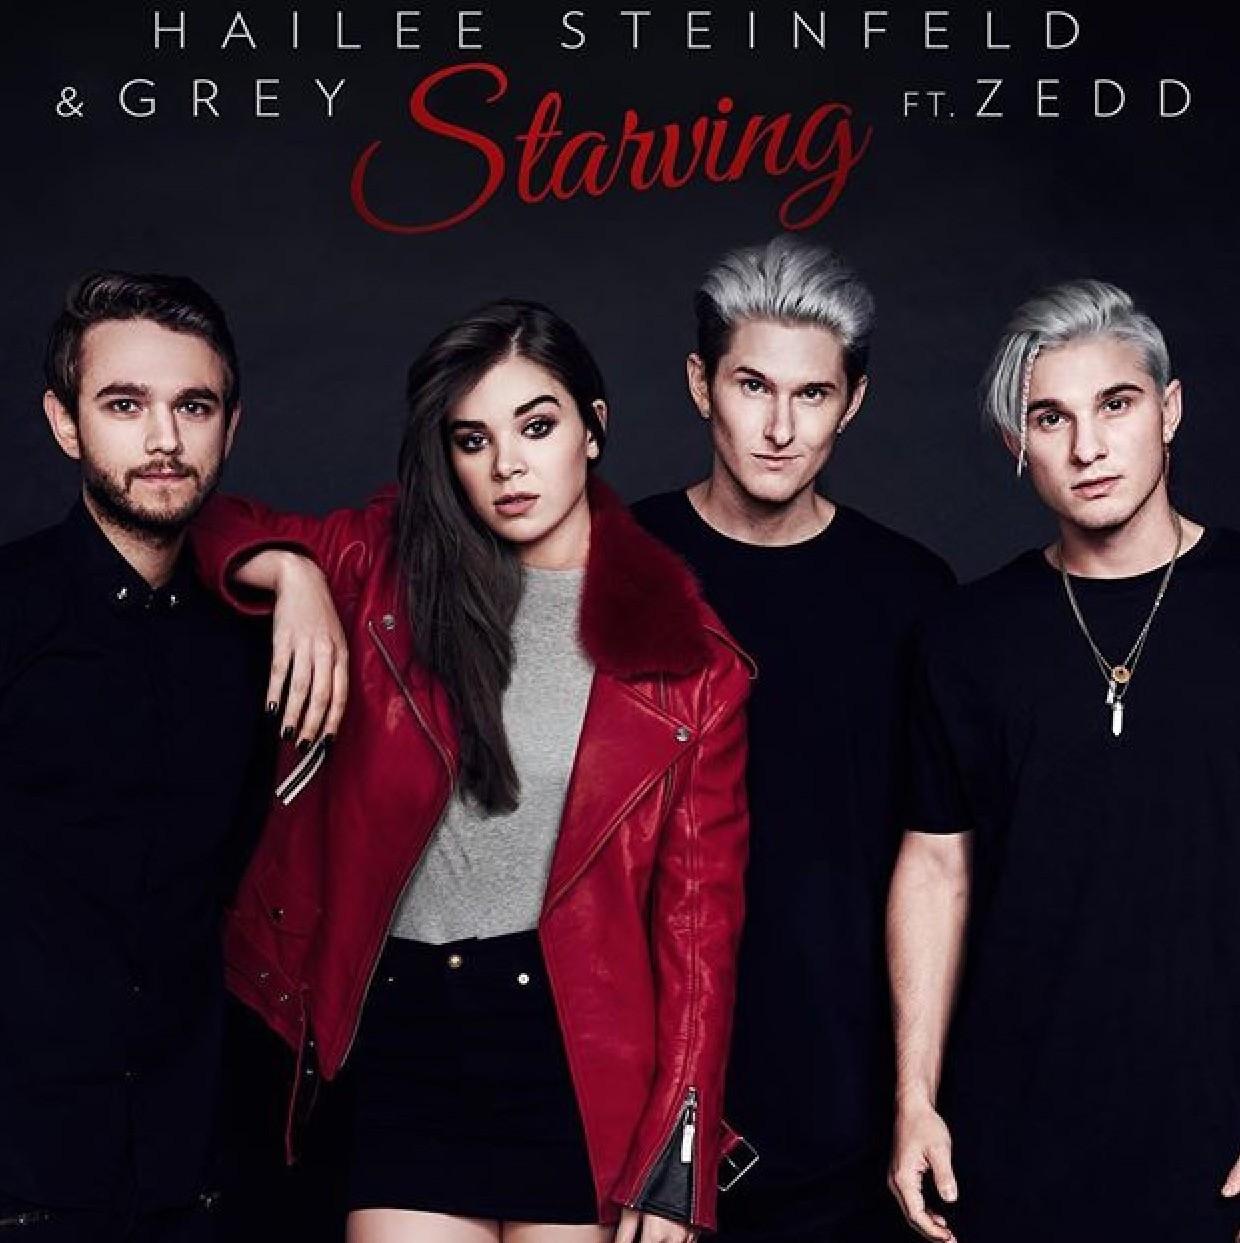 """Starving"" - Hailee Steinfeld & Grey ft. Zedd"